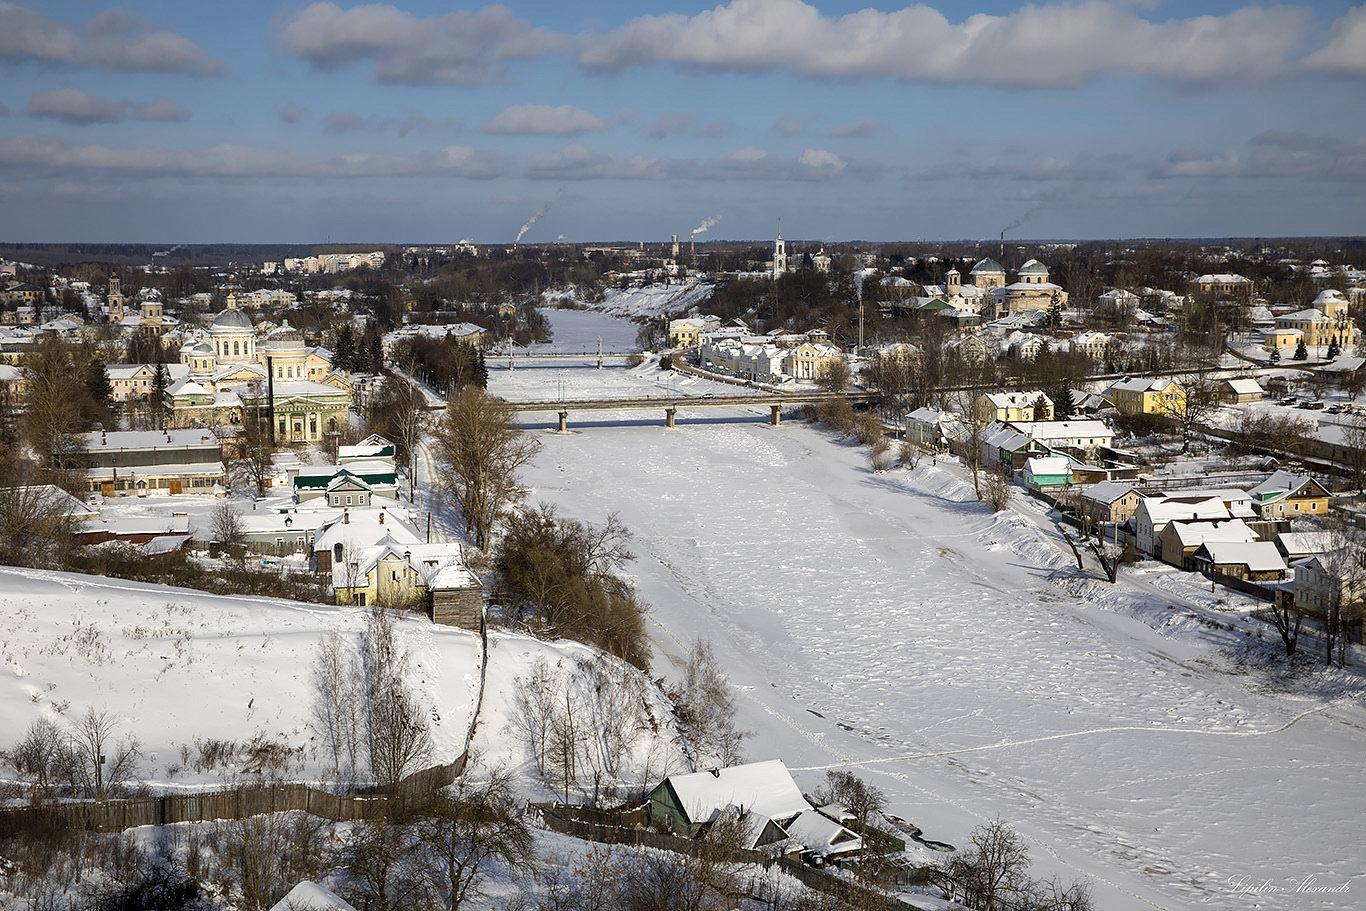 Area of the Chelyabinsk region in thousand km2. The population of the Chelyabinsk region